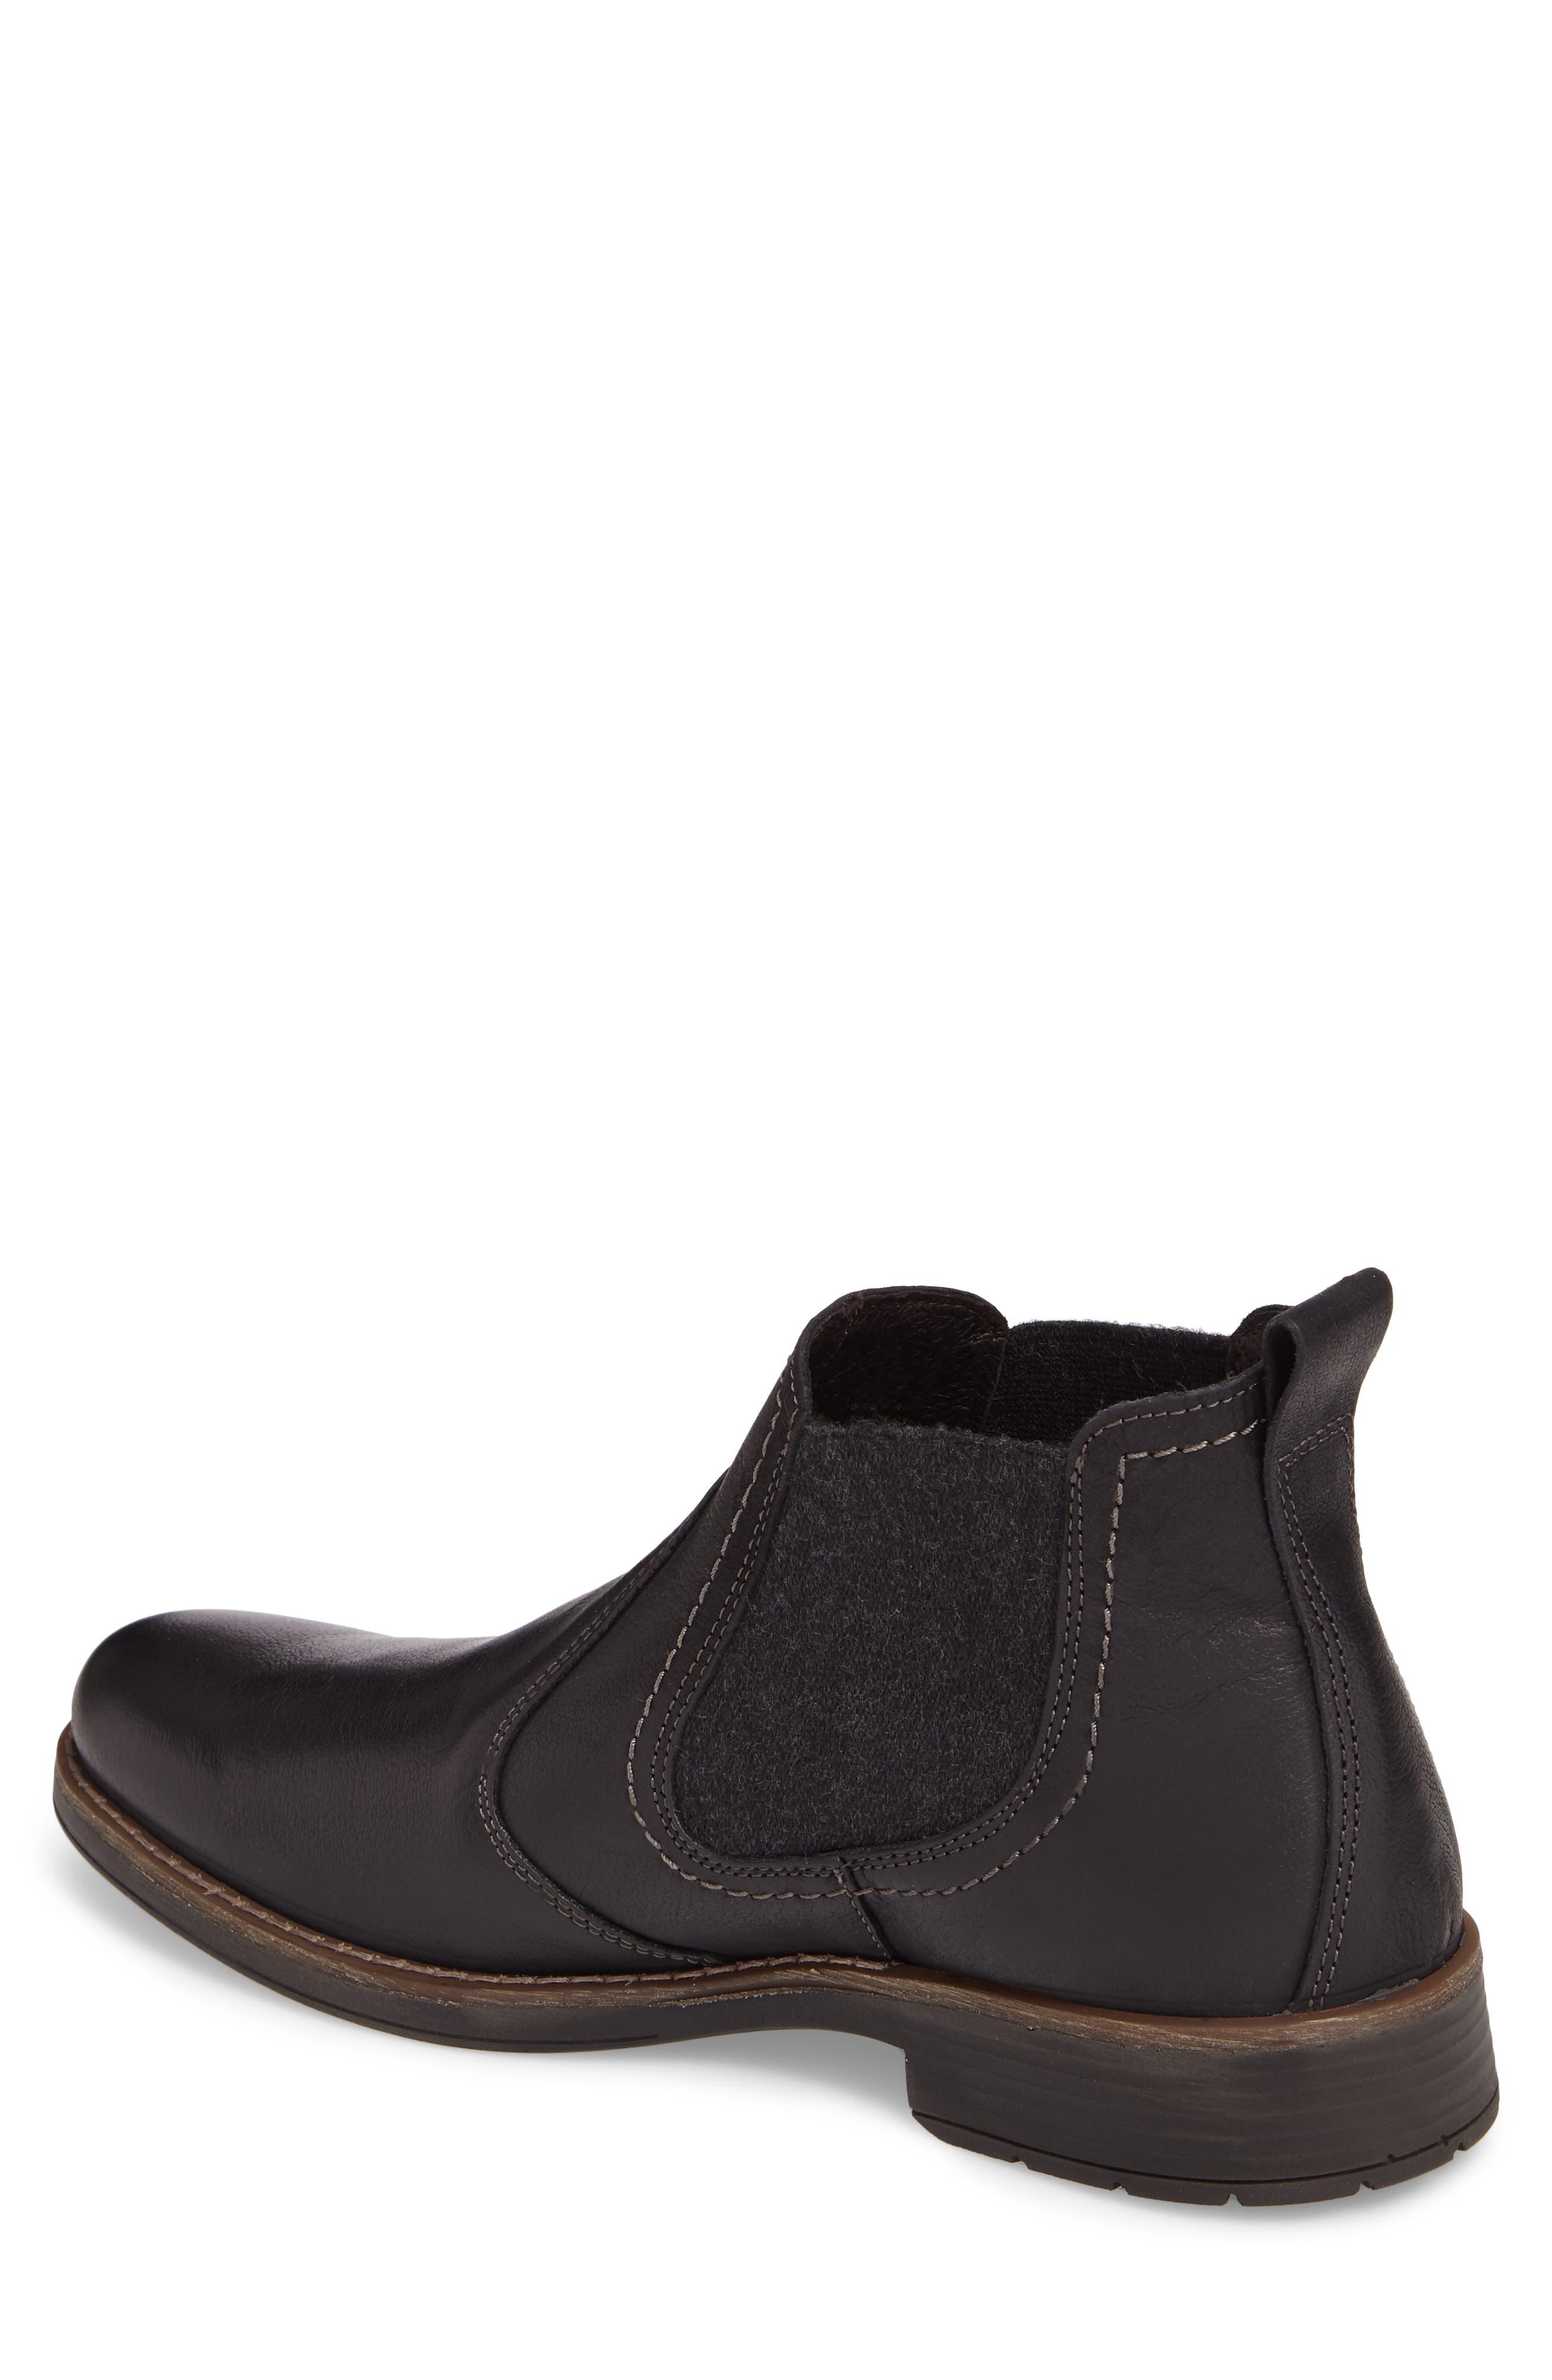 Spokane Chelsea Boot,                             Alternate thumbnail 2, color,                             Black Leather